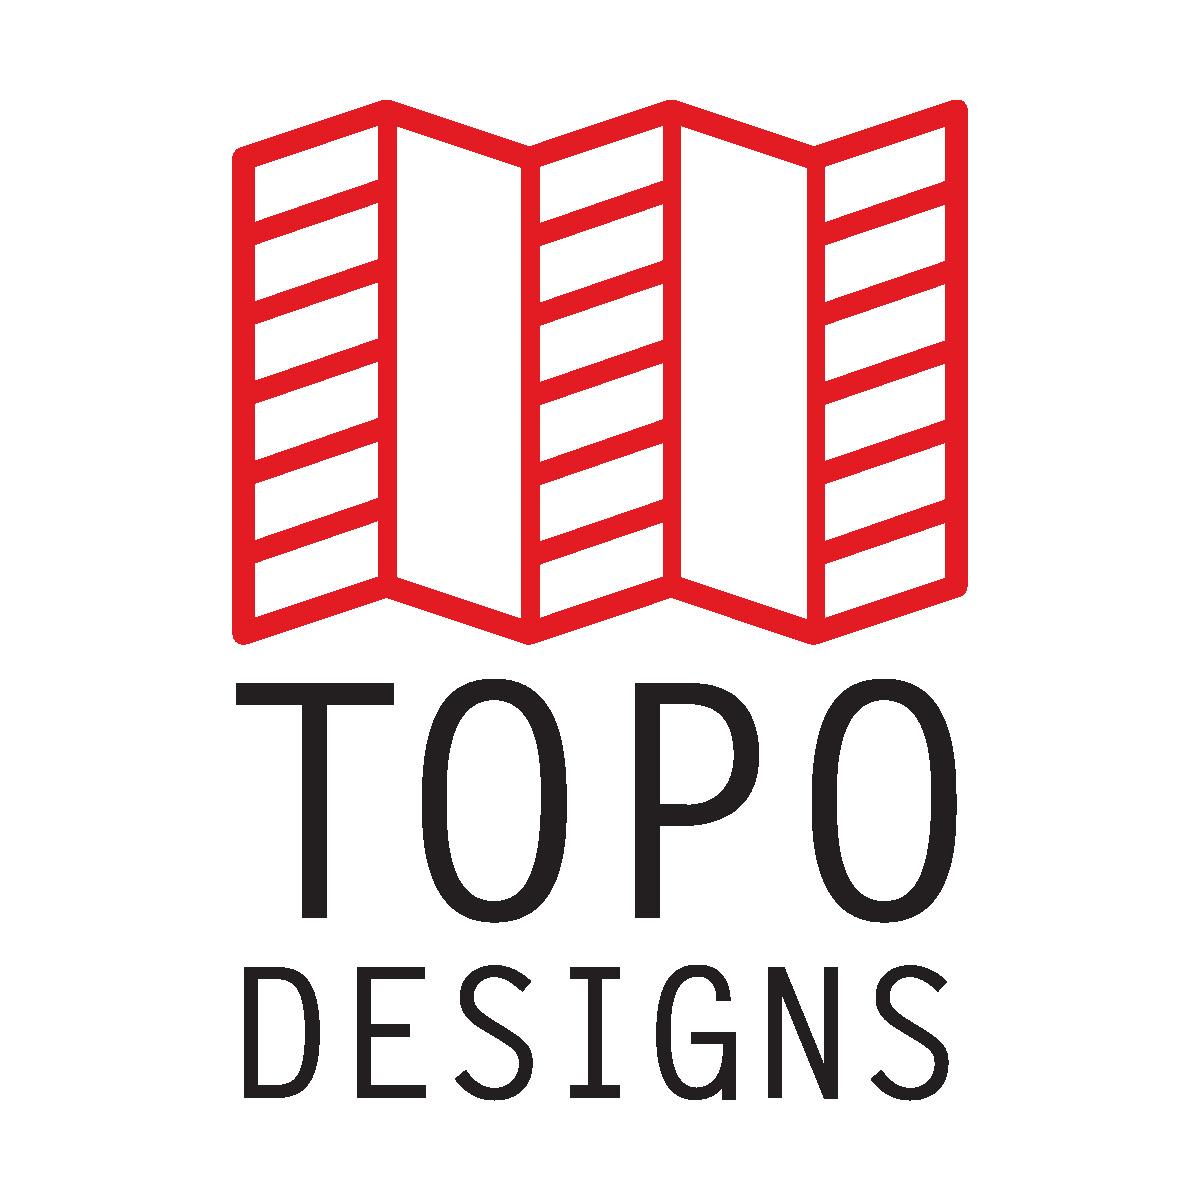 topo-designs-logo.jpg